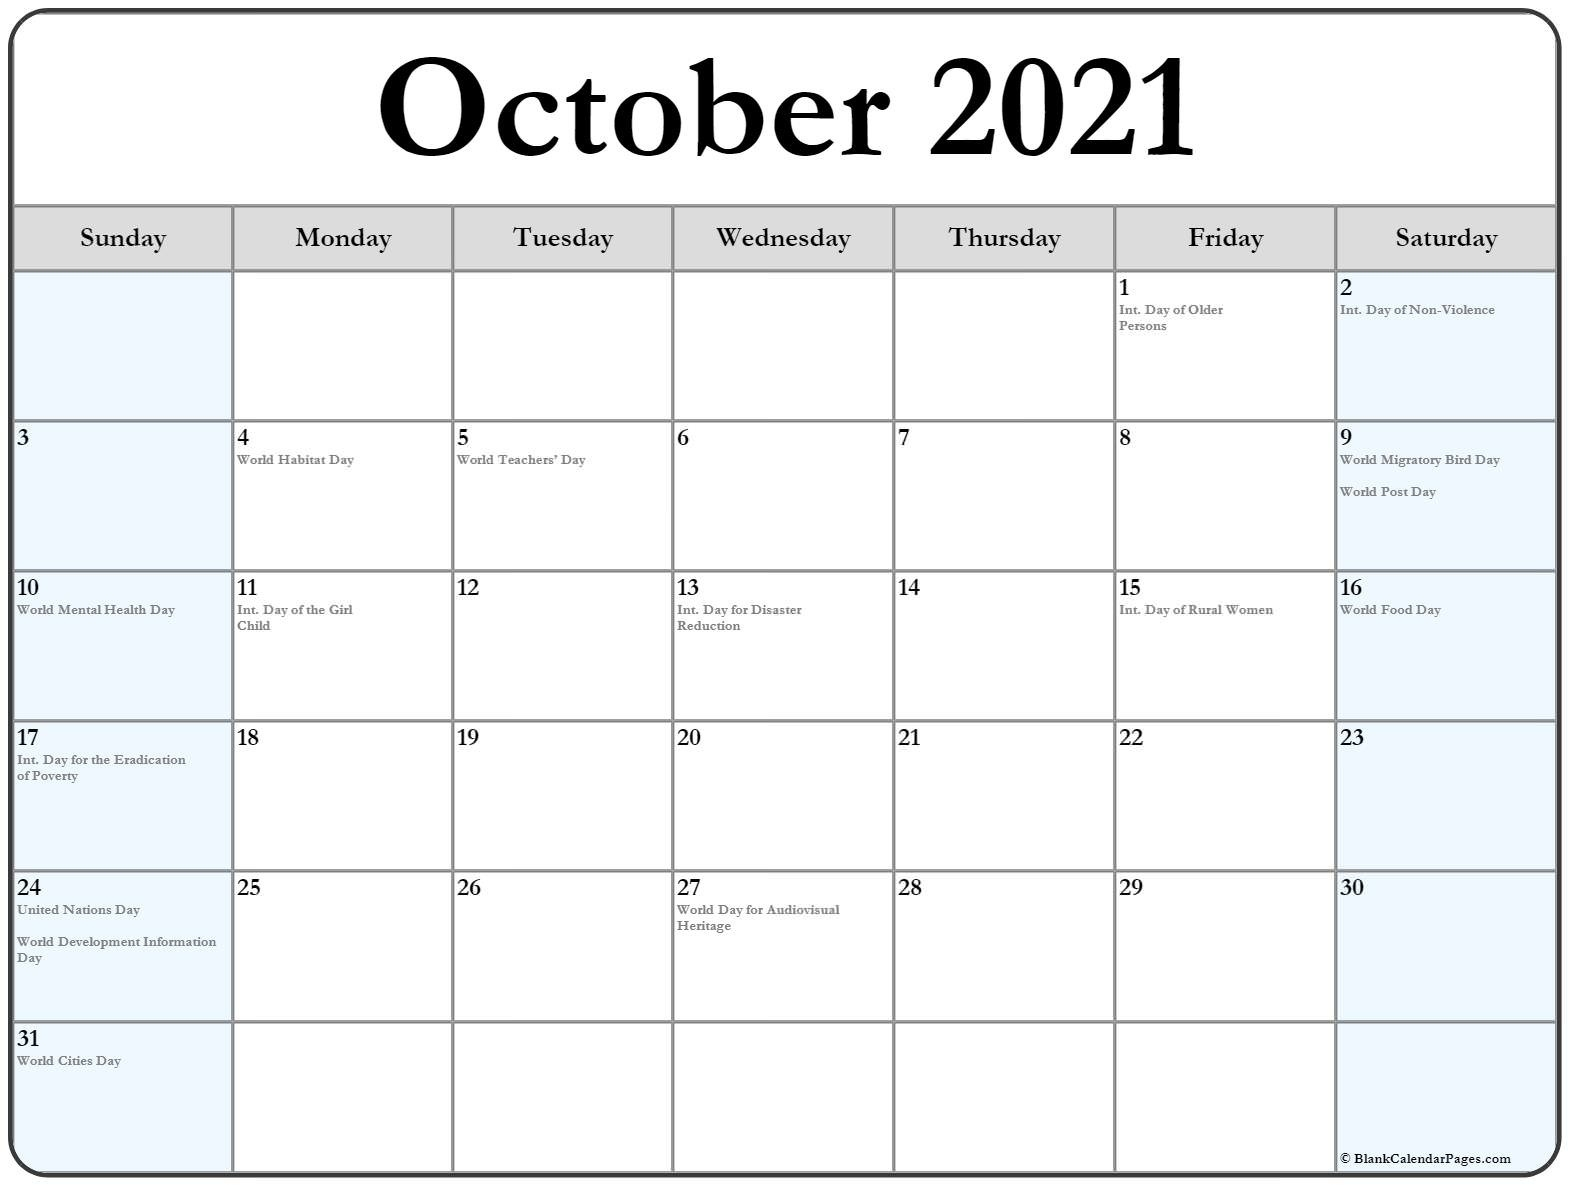 October 2021 Calendar With Holidays-Monthly Calendar Printable October 2021